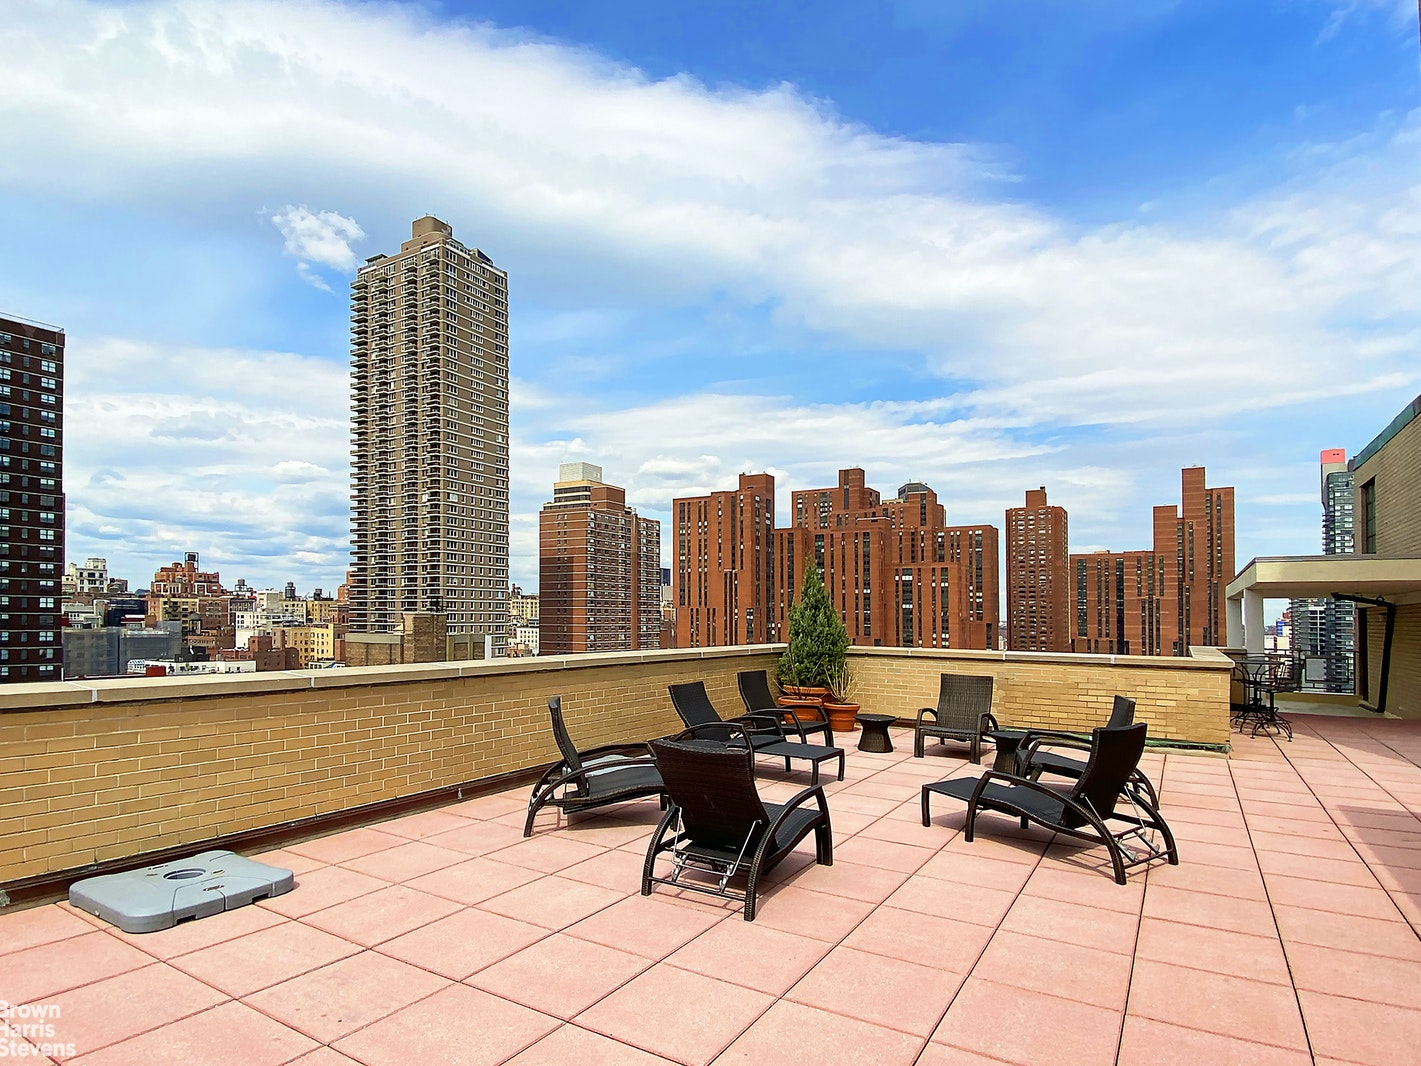 245 EAST 87TH STREET 4B, Upper East Side, $1,000,000, Web #: 20841302